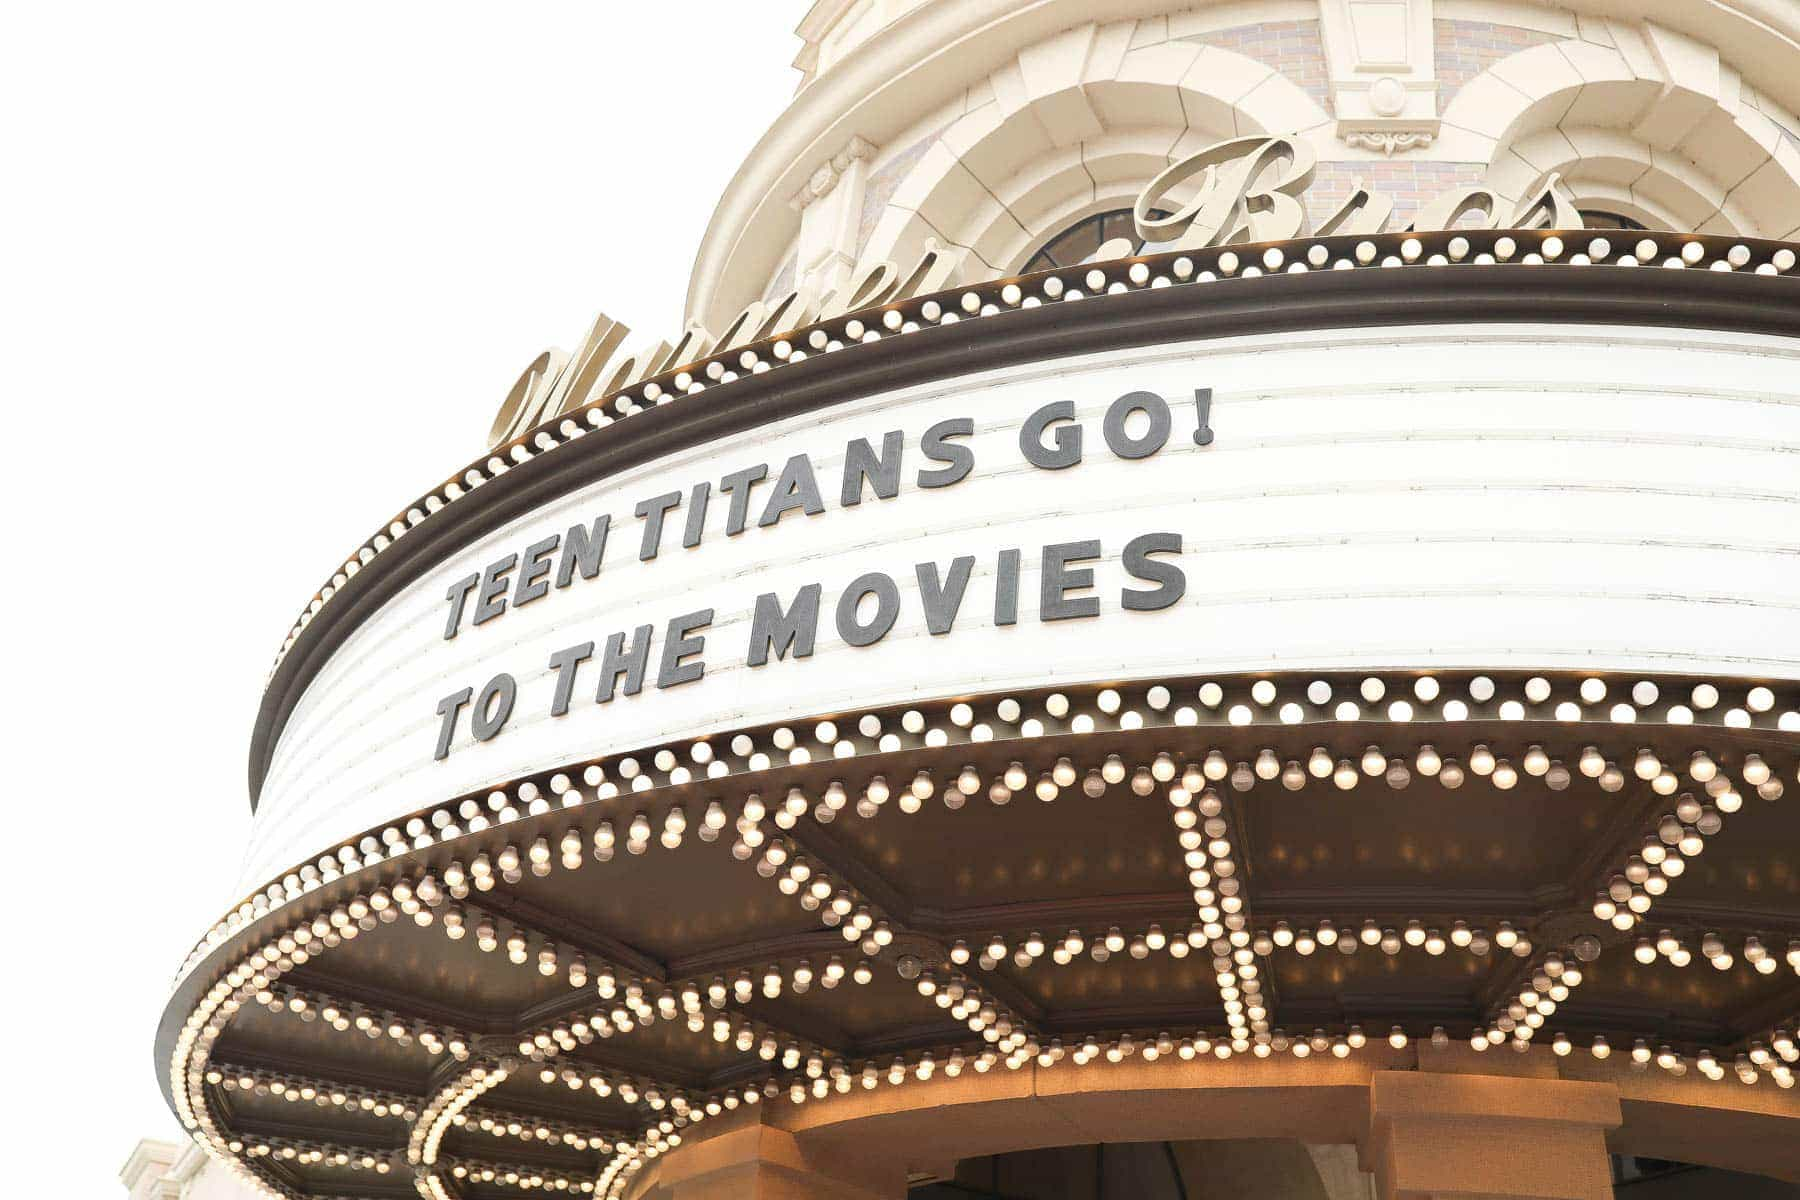 Warner Bros Teen Titans Go! To The Movies #hollywood #warnerbrothers #teentitansgotothemovies #citygirlgonemom